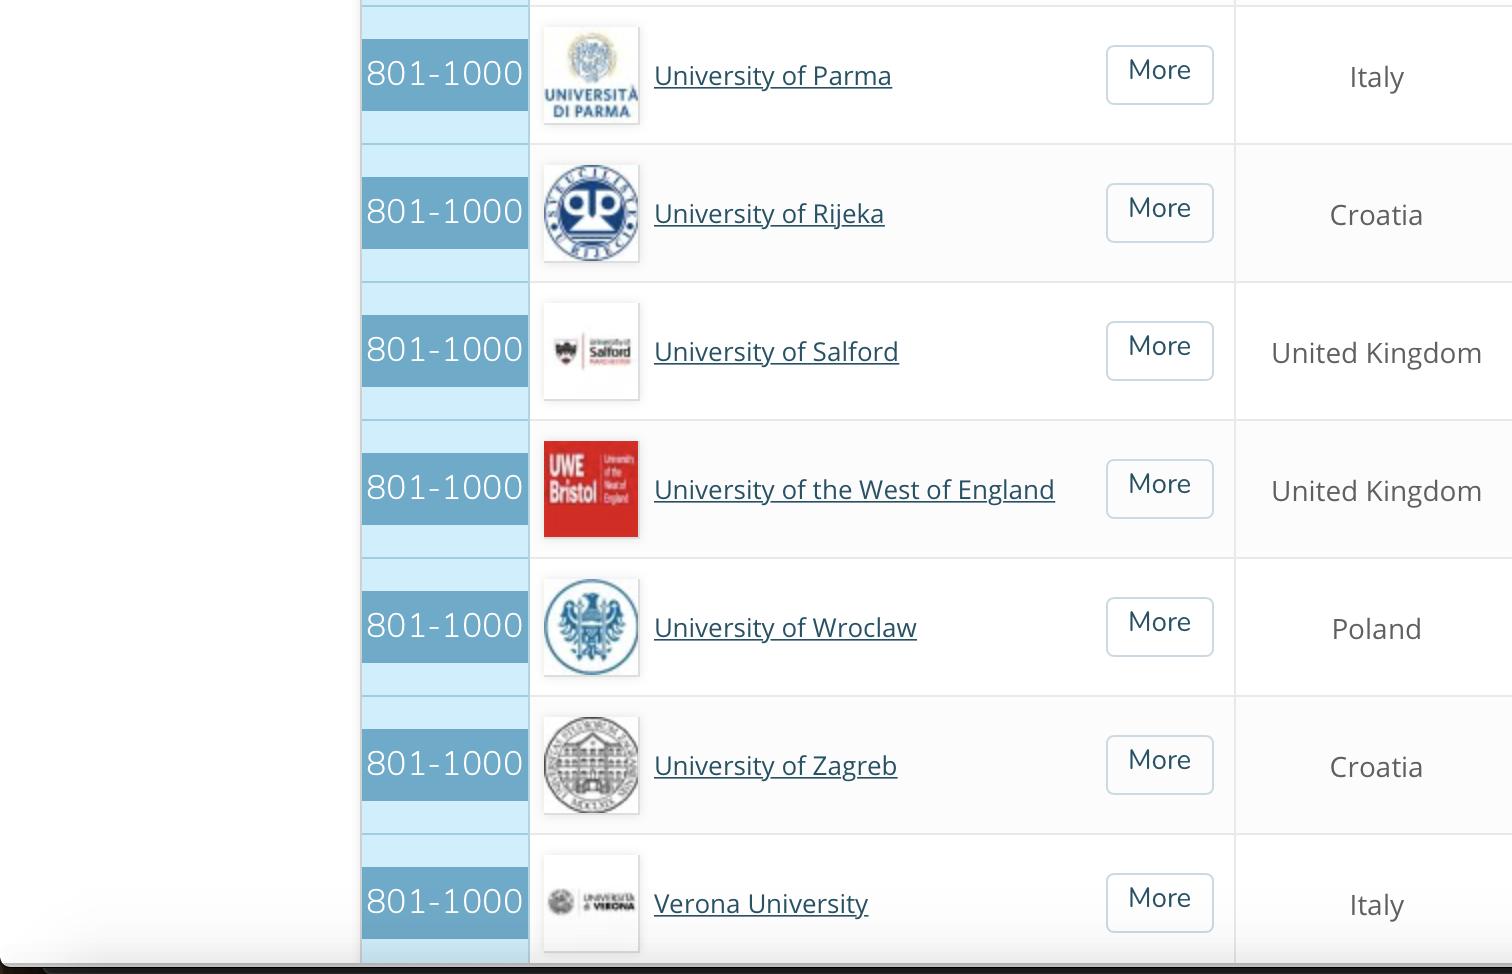 Uniri On Qs World University Rankings Scale Uniri